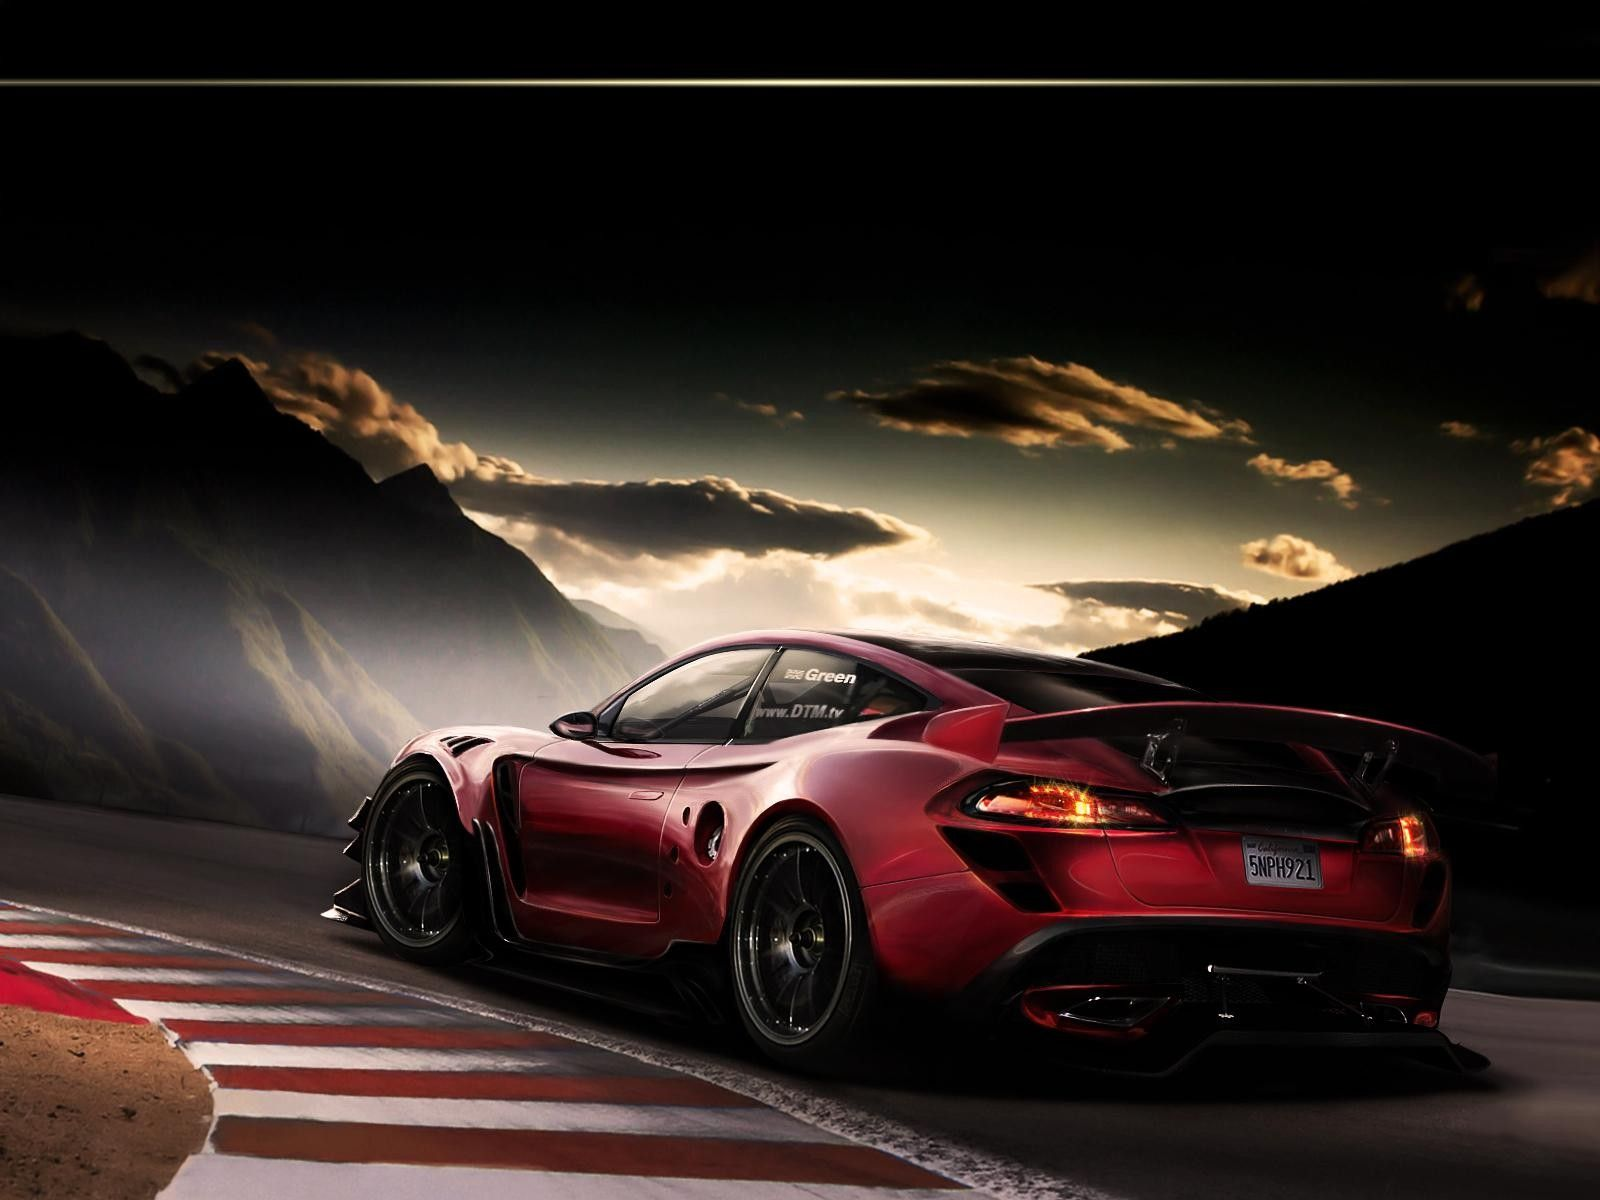 Super Sports Car Wallpapers Thatll Blow Your Desktop Away HD 1600x1200